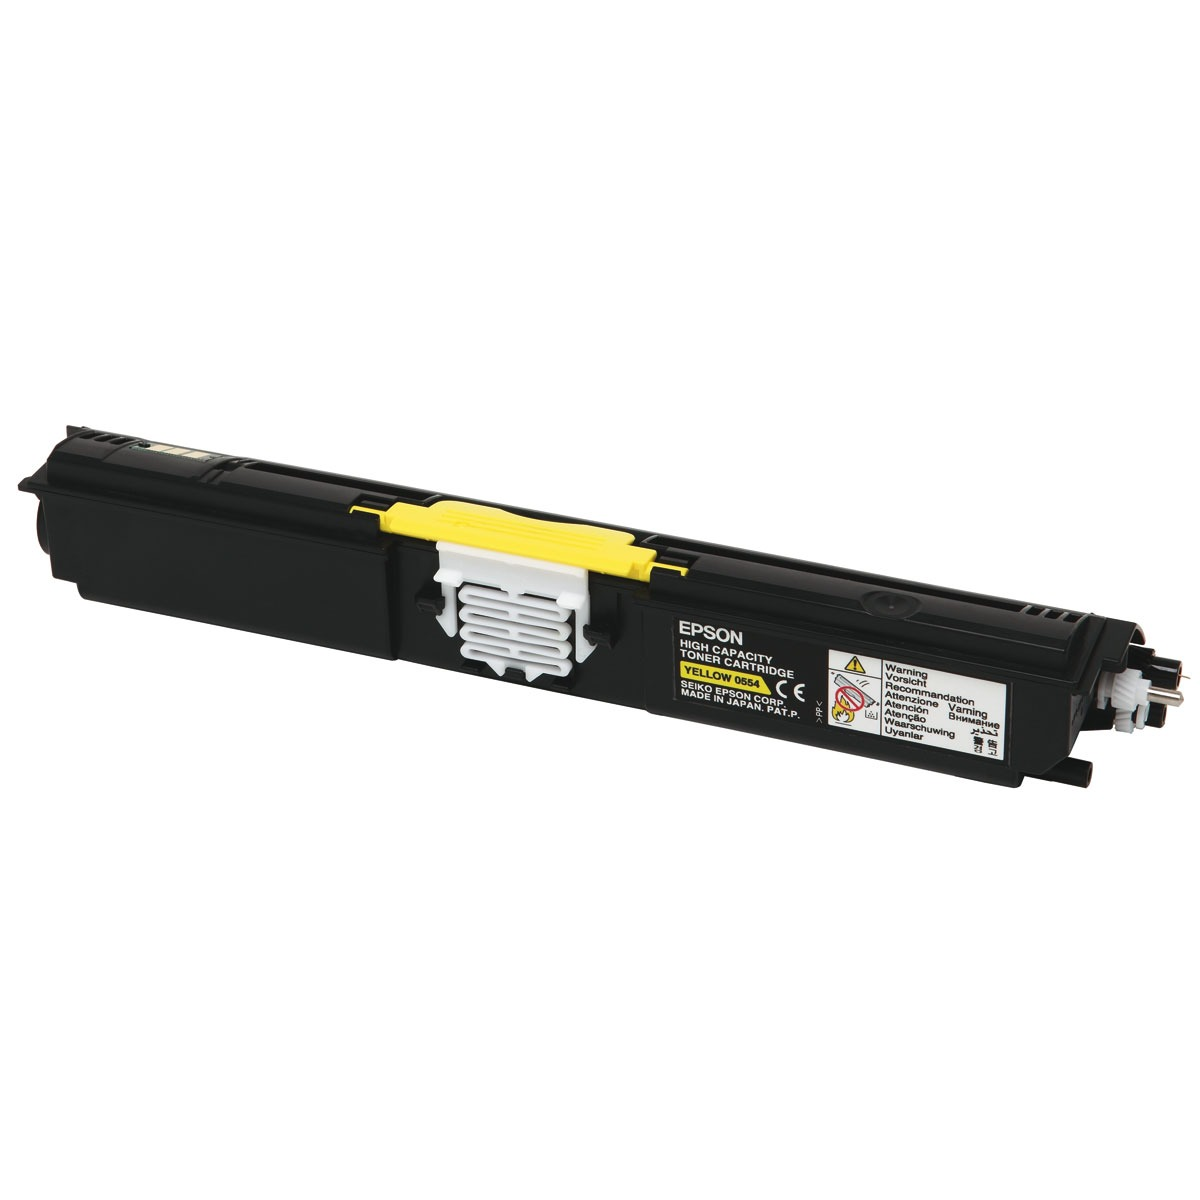 Toner imprimante Epson C13S050554 Epson C13S050554 - Toner Jaune Haute Capacité (2 700 pages)